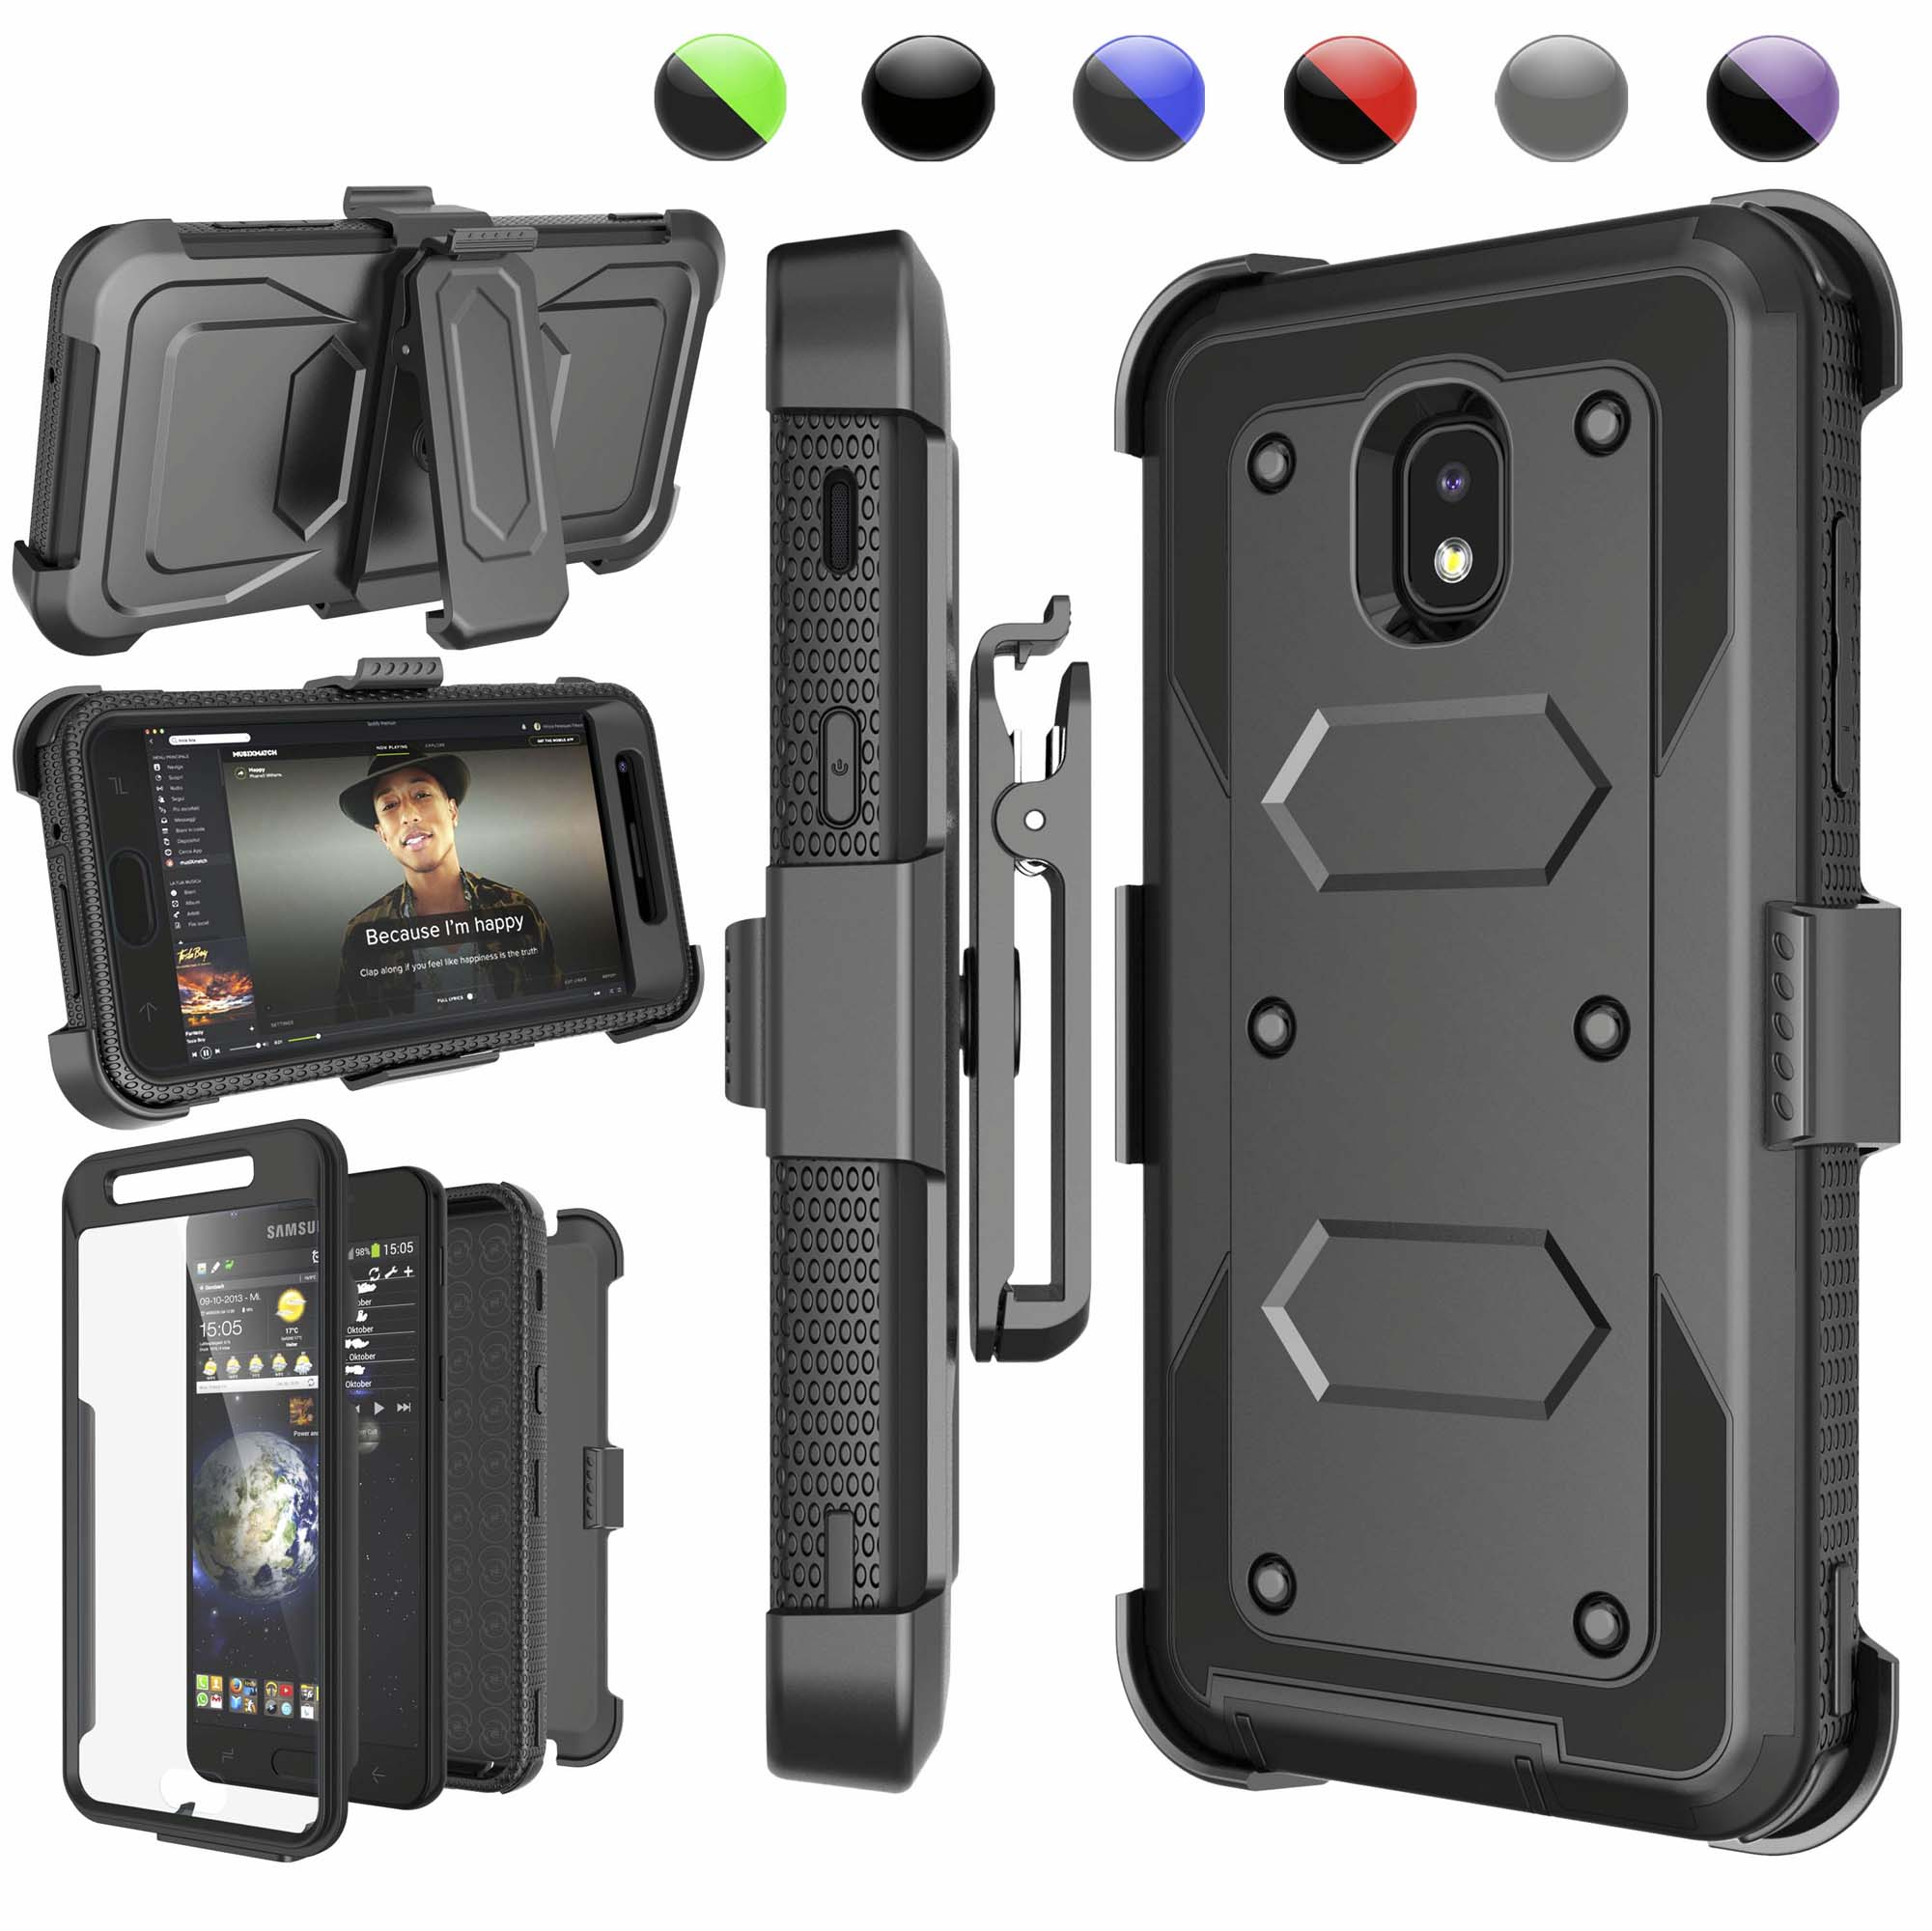 Galaxy J7 2018 Case, Njjex Samsung J7 Refine / J7 Aero / J7 Aura / J7 Crown / J7 Top / J7 Eon / J7 Star Case Holster, [Built-in Screen] & Kickstand + Holster Belt Clip Carrying Armor Case Cover